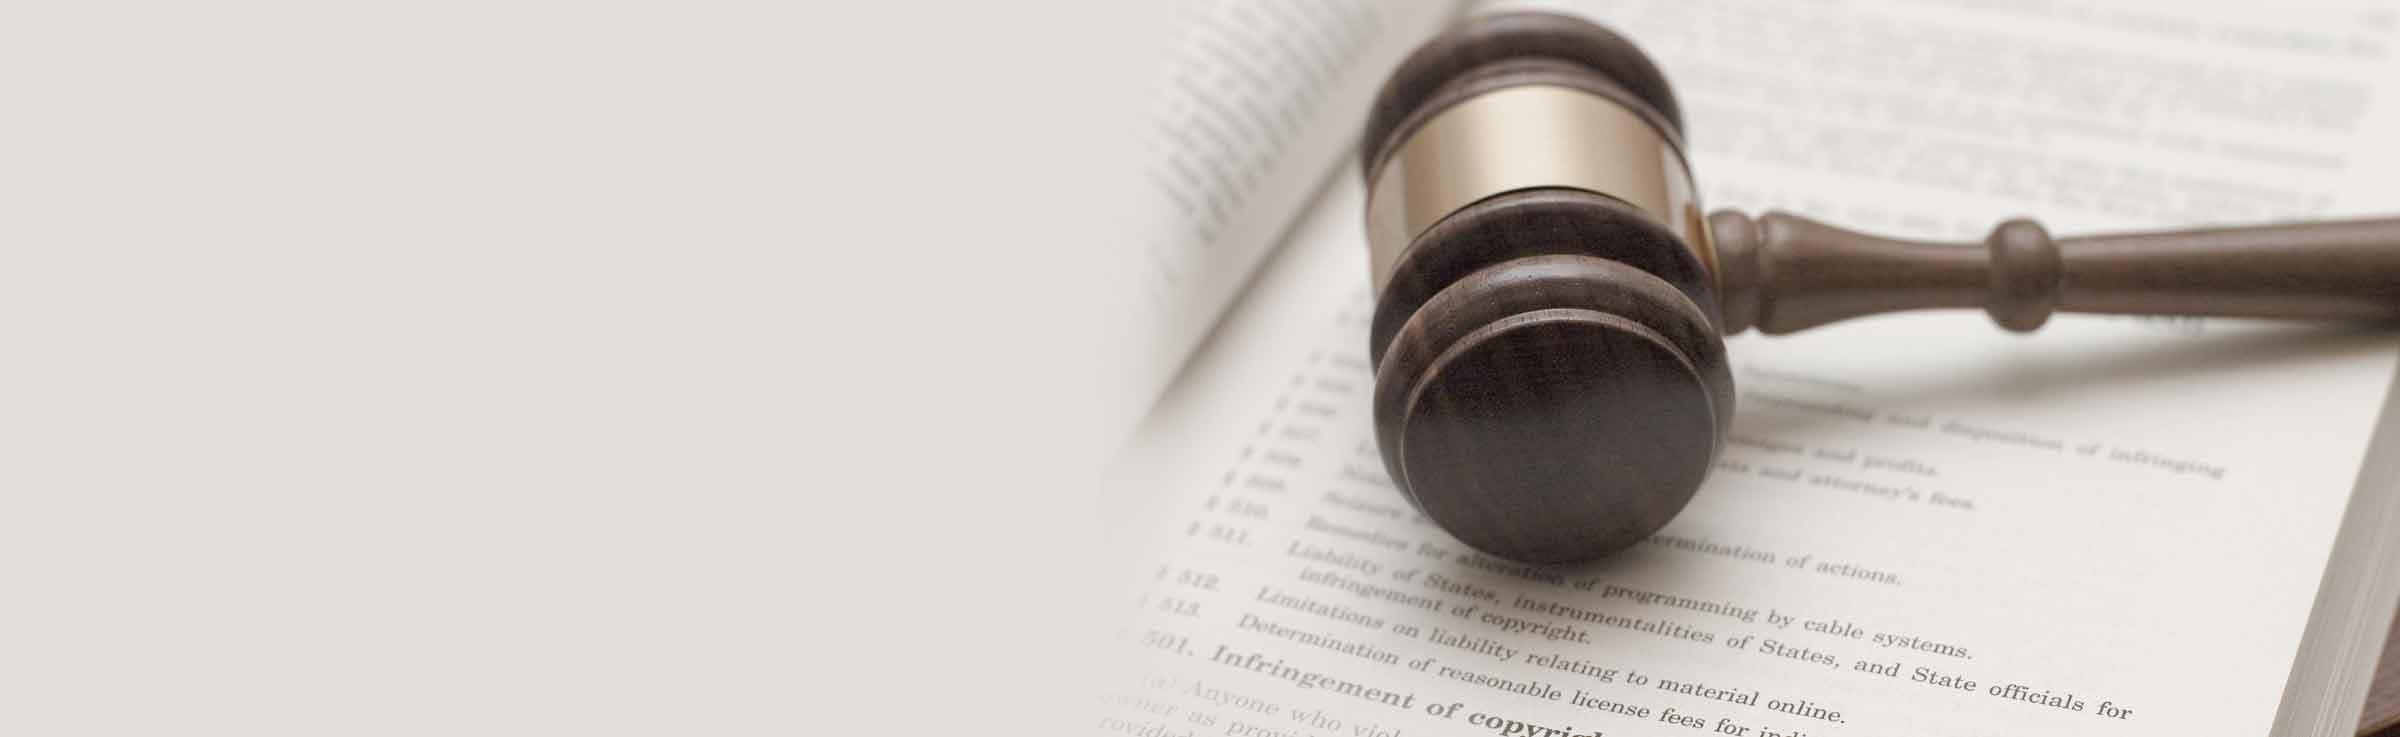 Filesharing Urteile Anwalt Kanzlei Wesaveyourcopyrights Frankfurt Rhein-Main Skyline Frankfurt